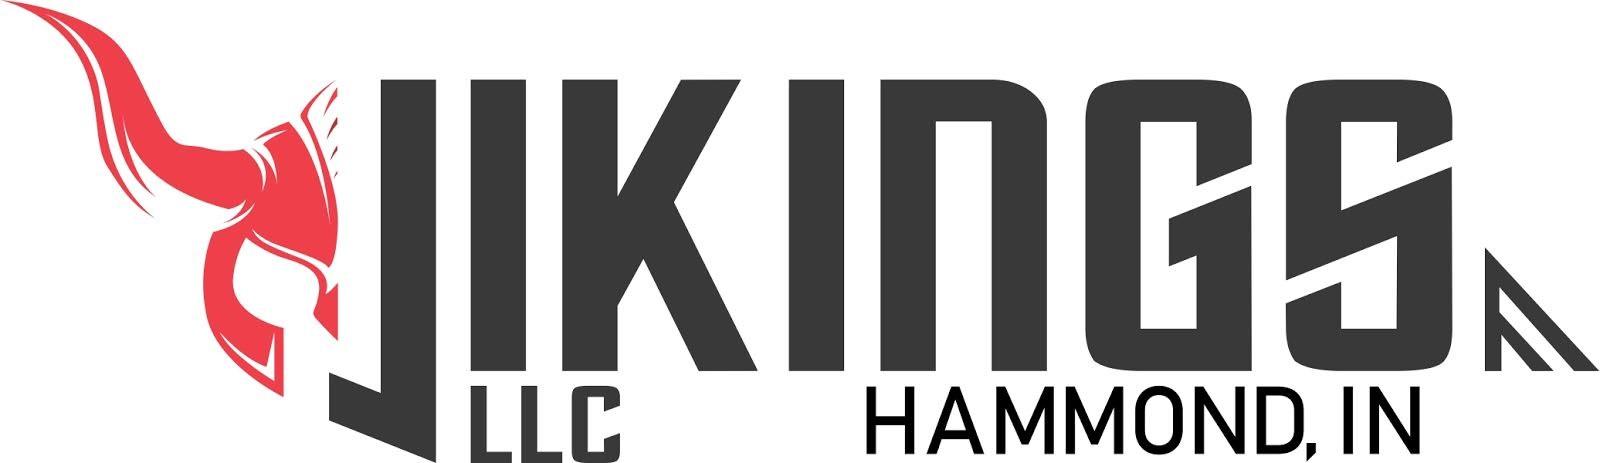 Vikings LLC